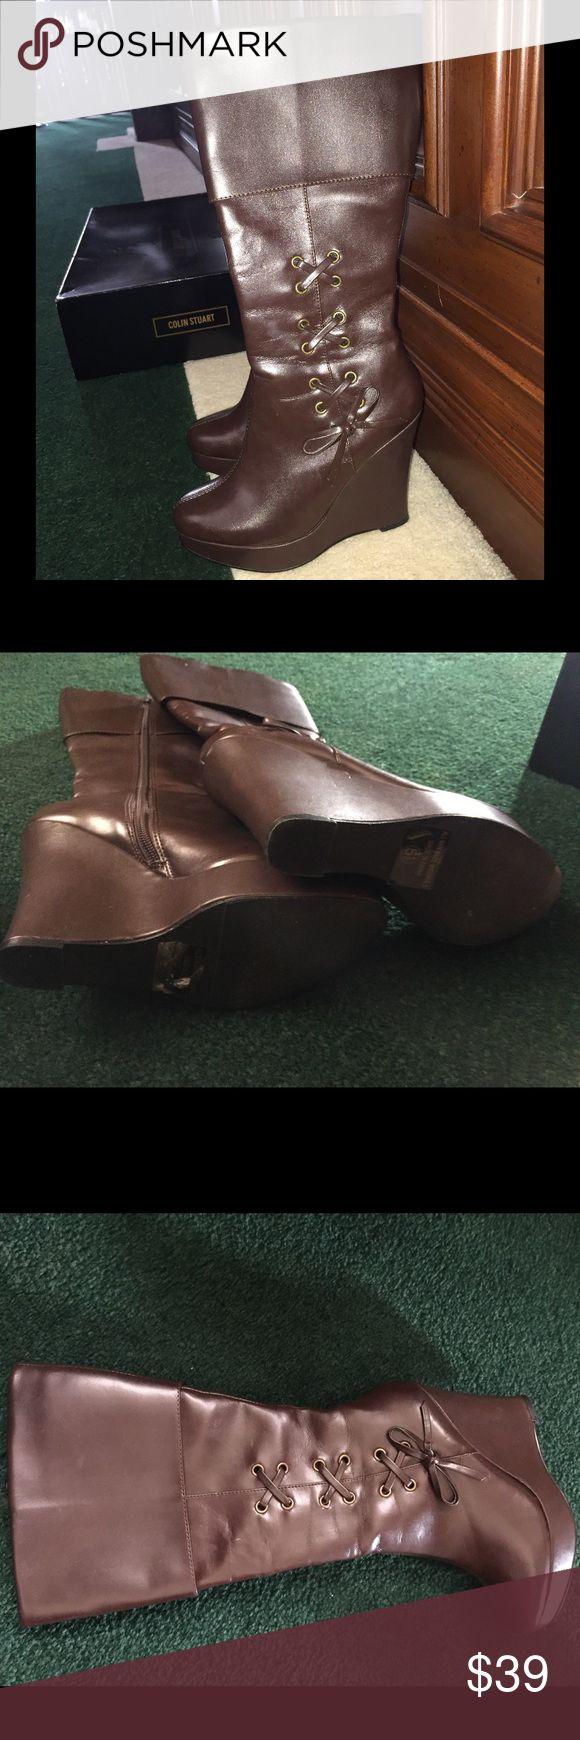 NWT Vegan leather Colin Stuart - zip wedge boots NWT Dark Chocolate Brown Vegan leather Colin Stuart - zip wedge boots Colin Stuart Accessories